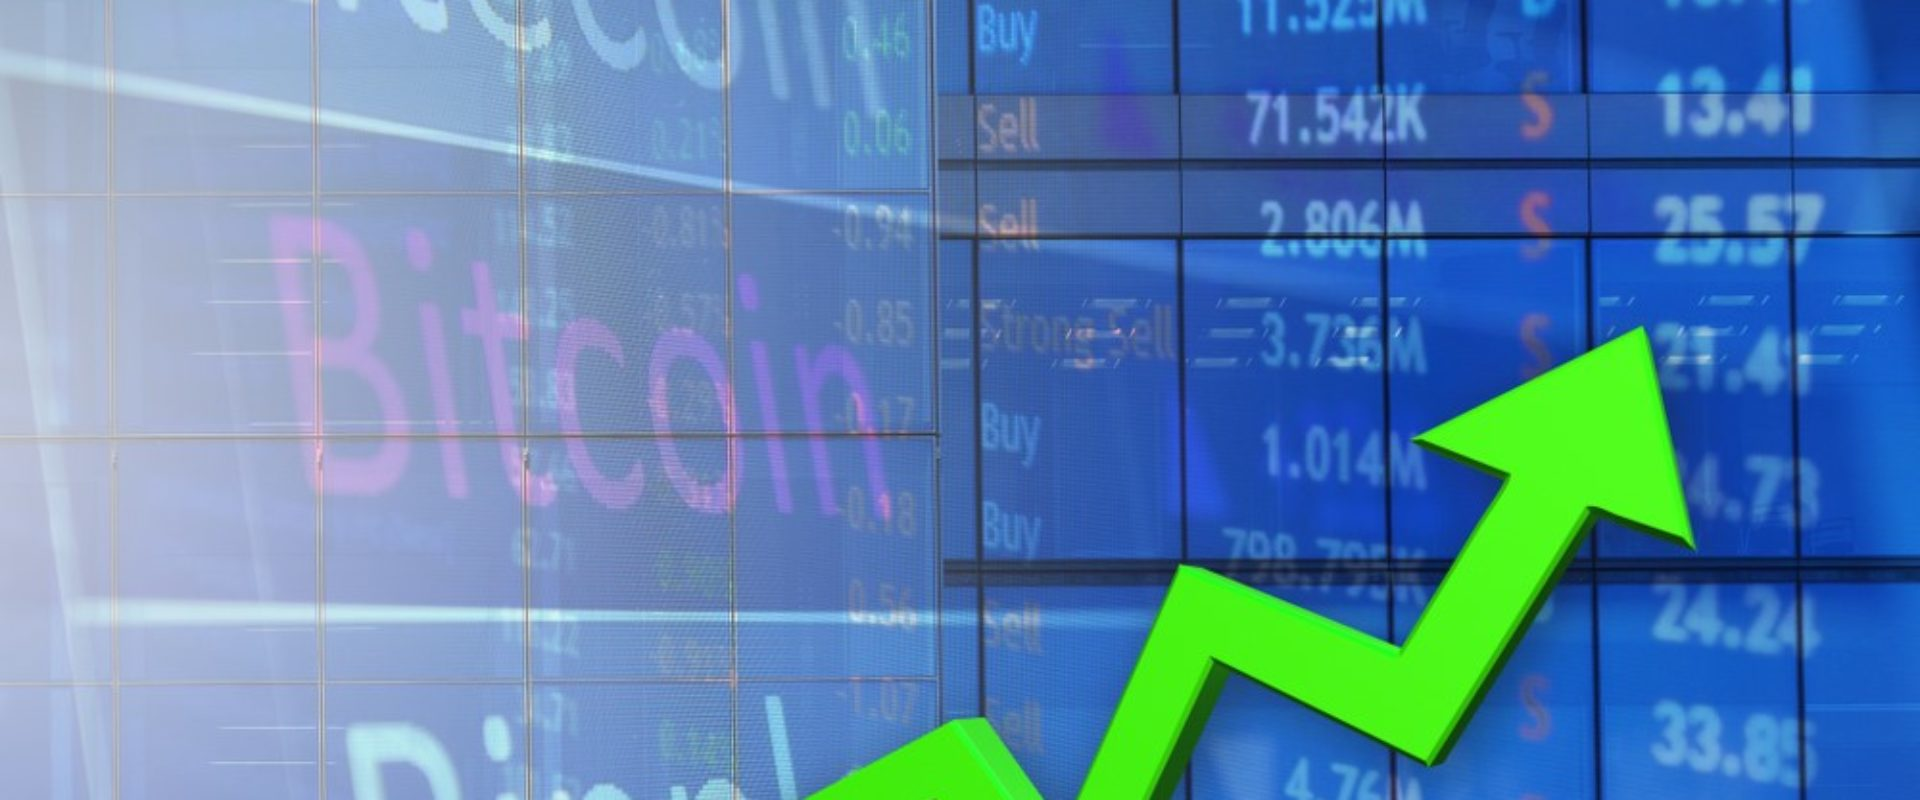 Crypto Market Aims $250 Billion Cap: Bitcoin Cash, Litecoin, EOS, XLM Analysis